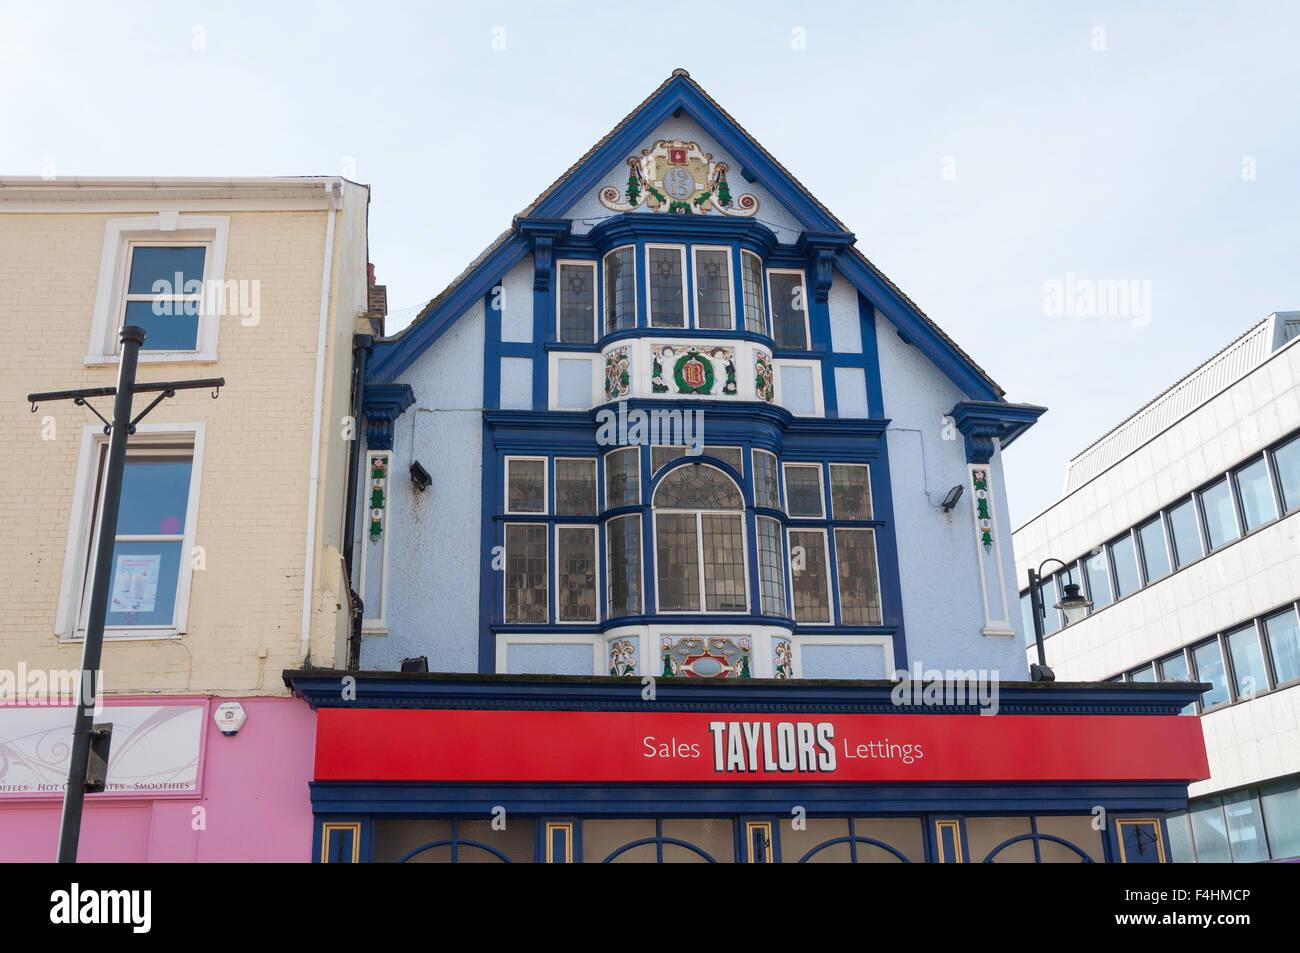 Ornate Edwardian building, cnr. George & Chapel Streets, Luton, Bedfordshire, England, United Kingdom - Stock Image